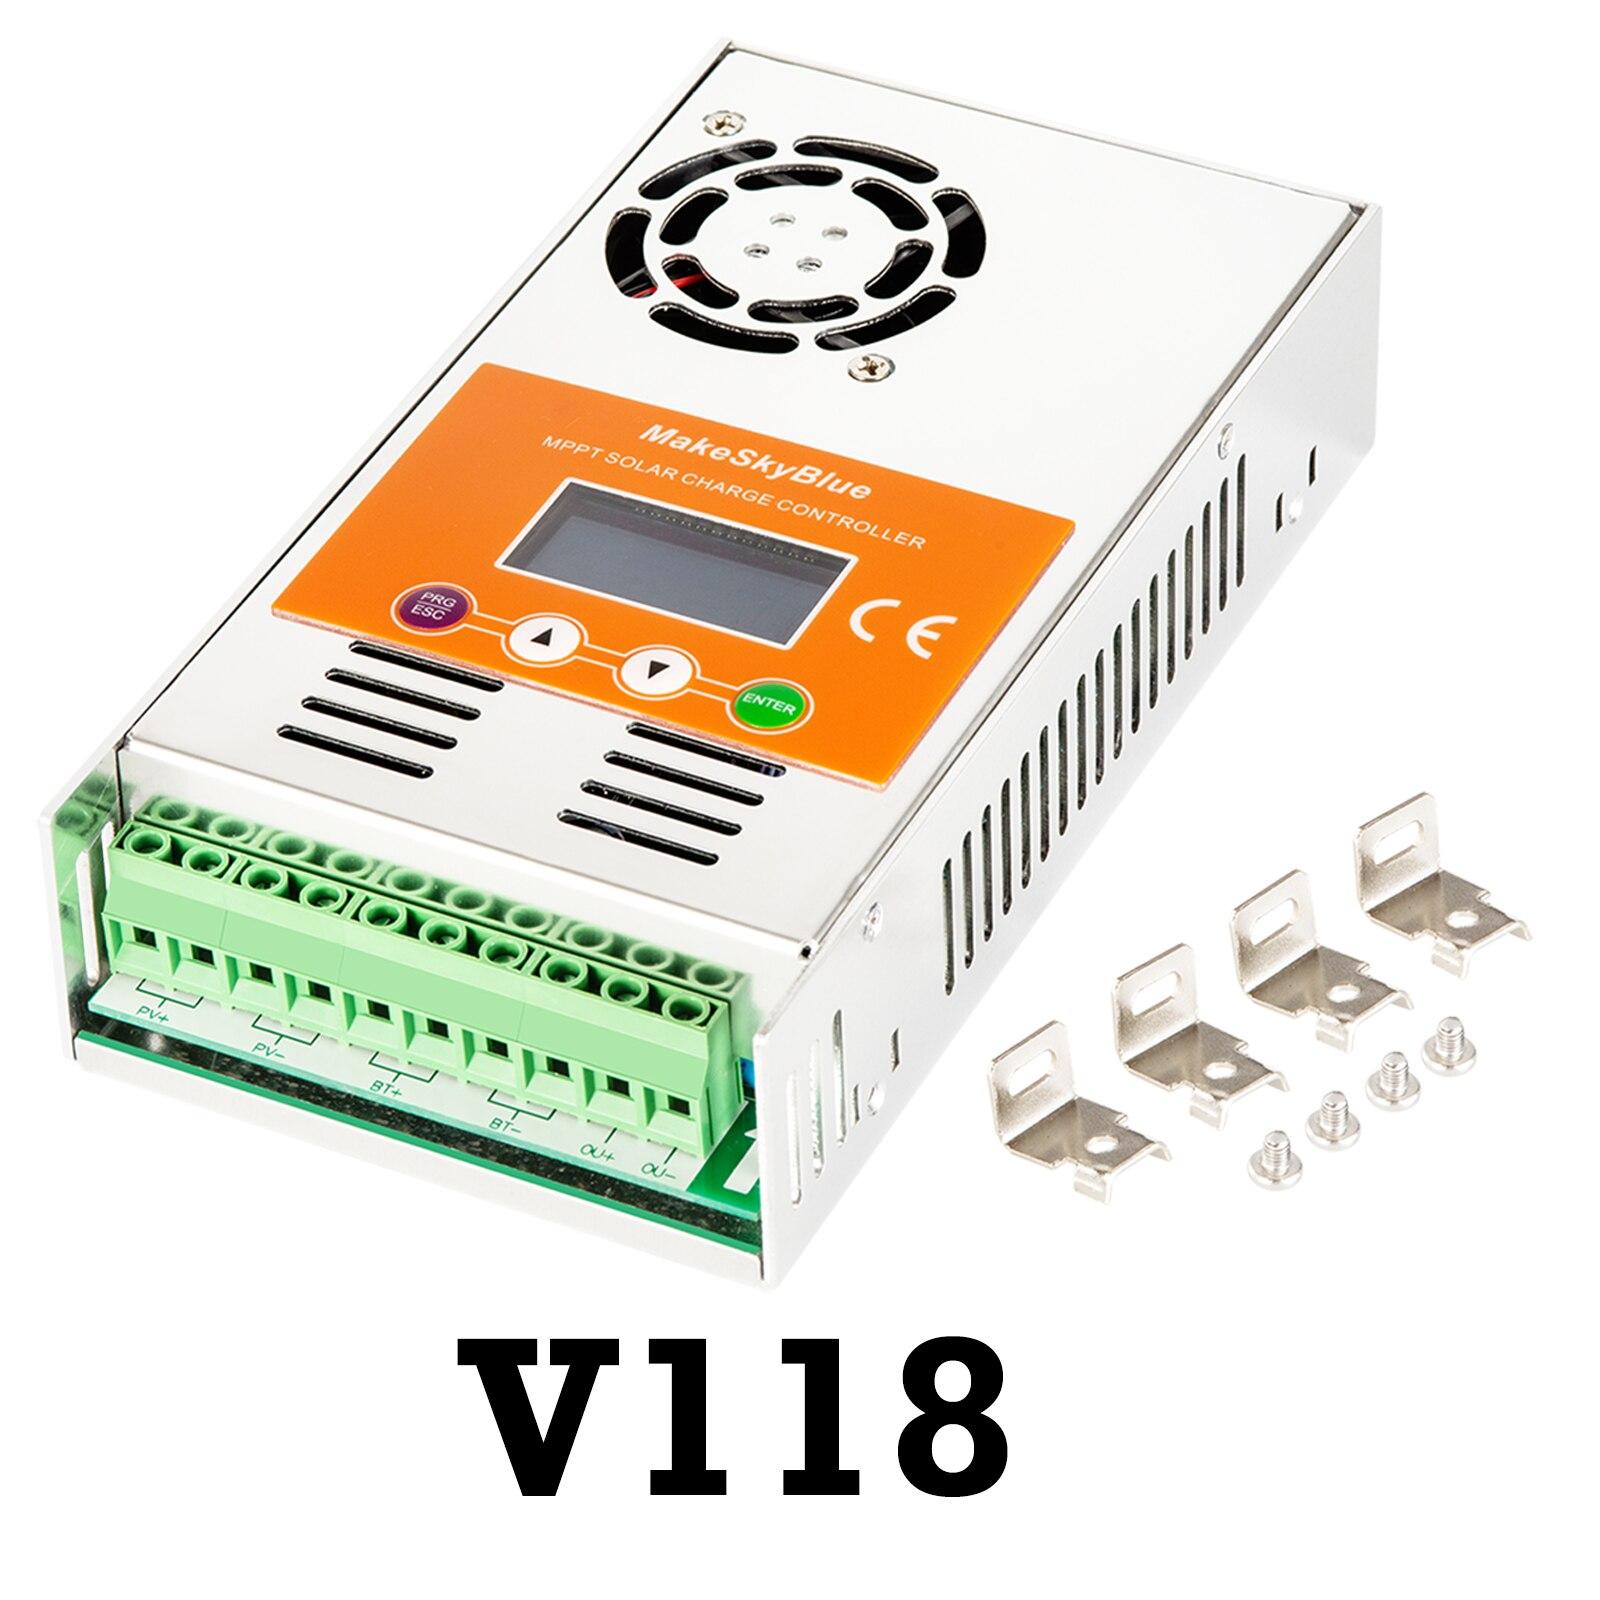 MPPT Charge Controller 60A Plus Version V118 LCD Display Parameter Ajustable Solar Panel Charging Regulator